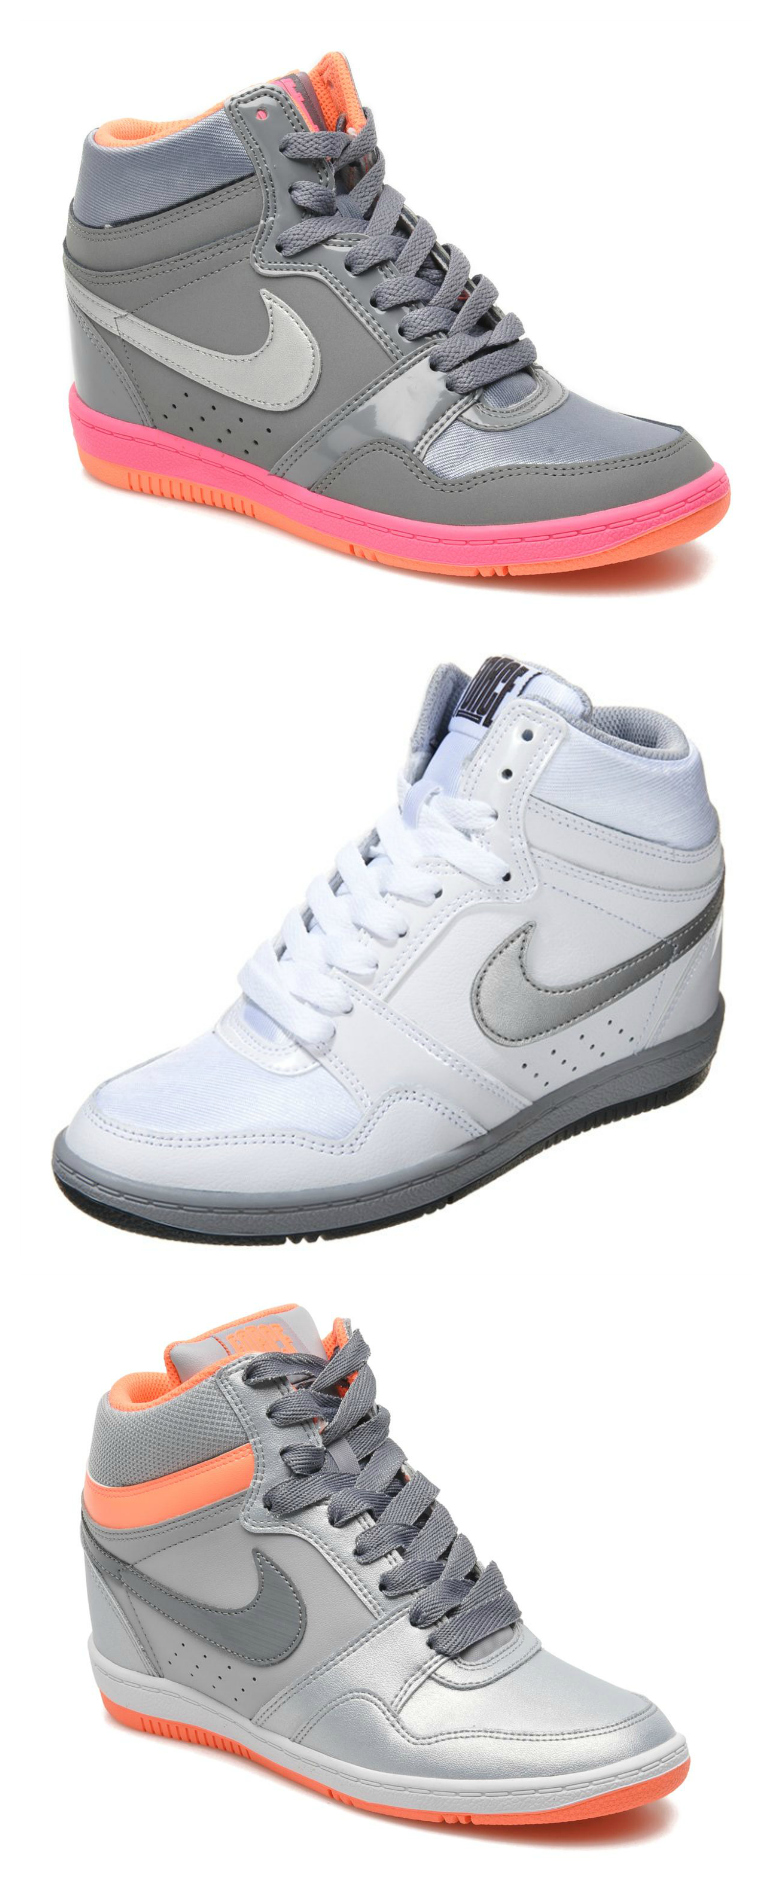 dbc3a154f44 nike sneaker wedges Archives - fashionisaparty.com » fashionisaparty.com